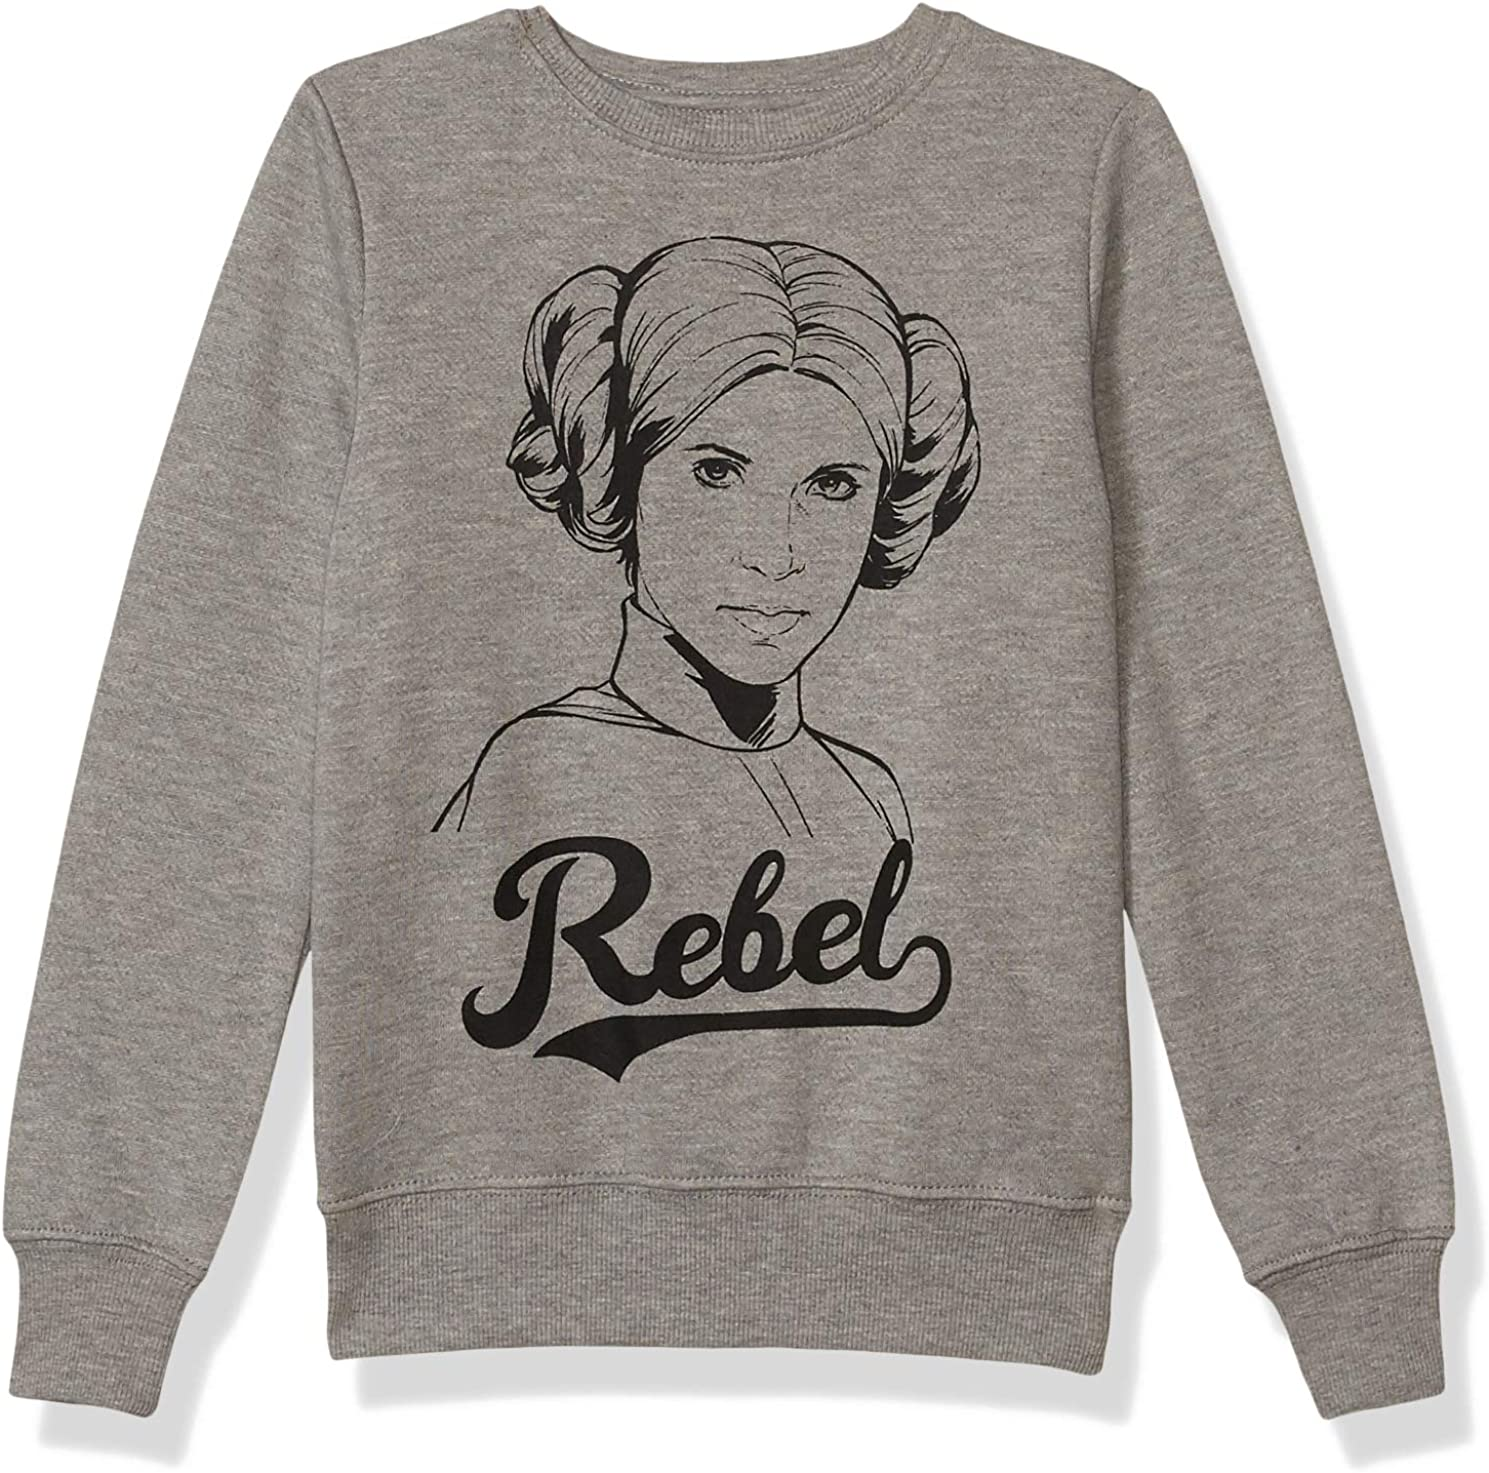 Spring Free shipping / New new work STAR WARS Sweatshirt Girls'